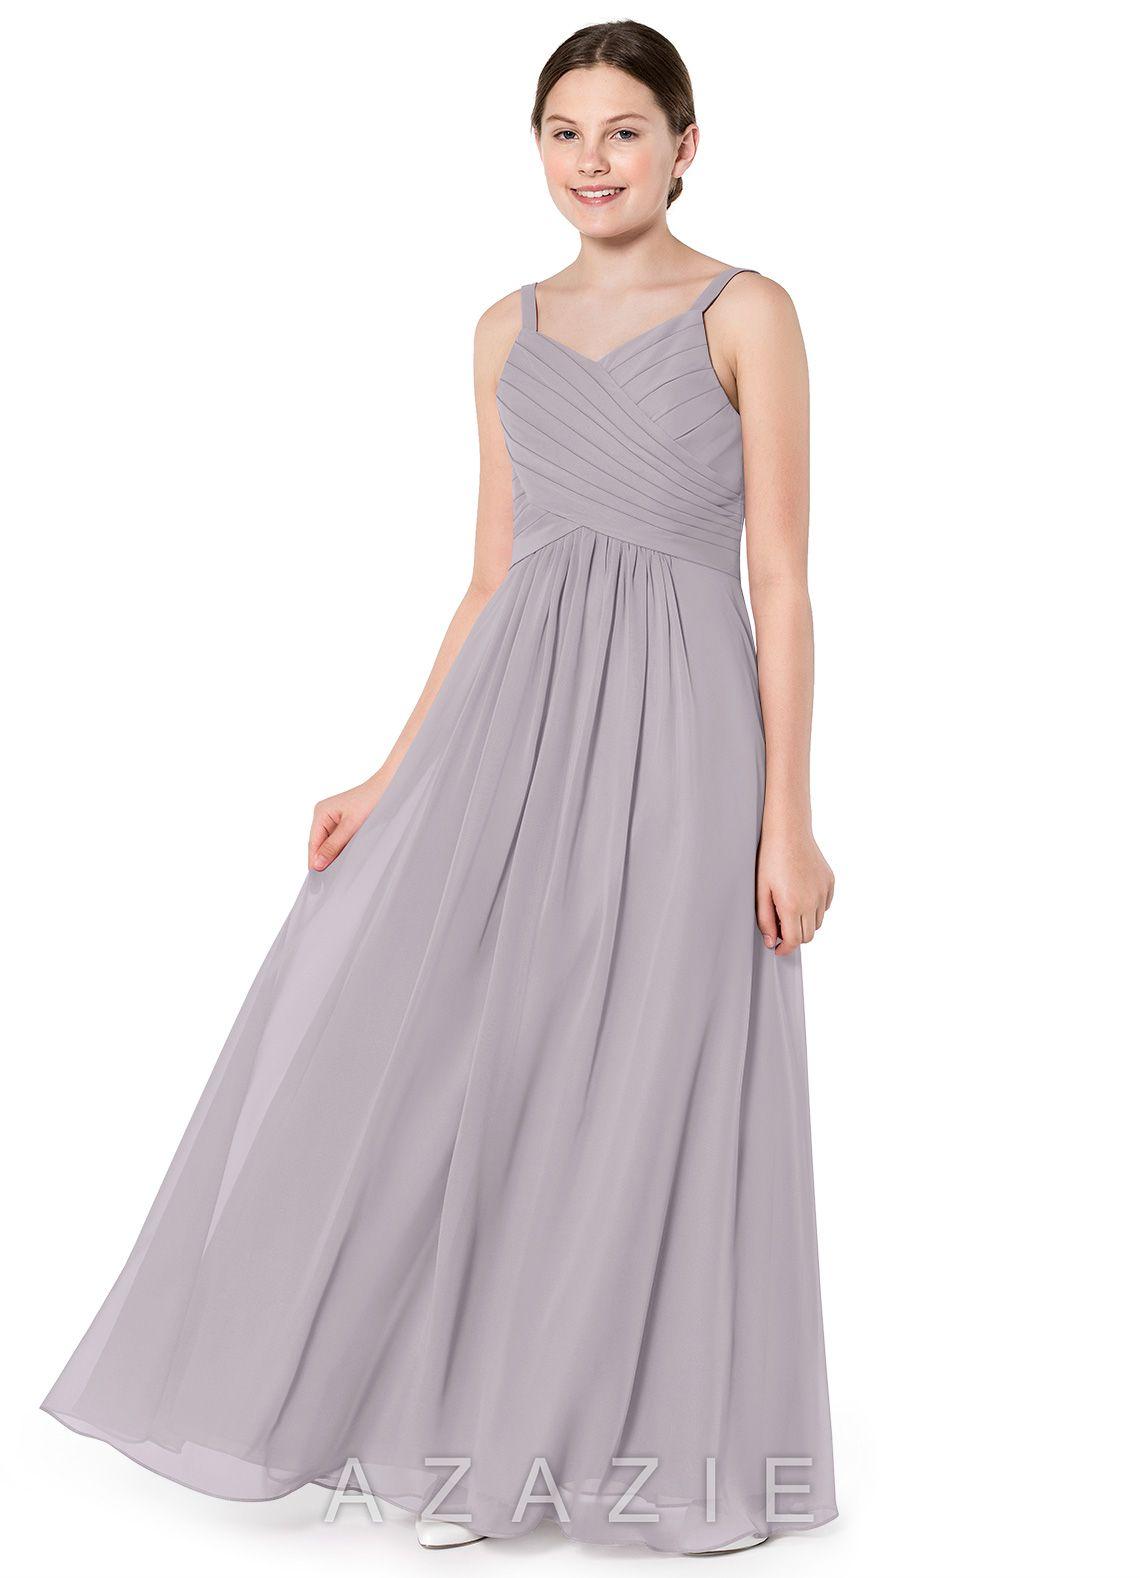 8f9ce26913b Azazie Haleigh JBD Junior Bridesmaid Dress